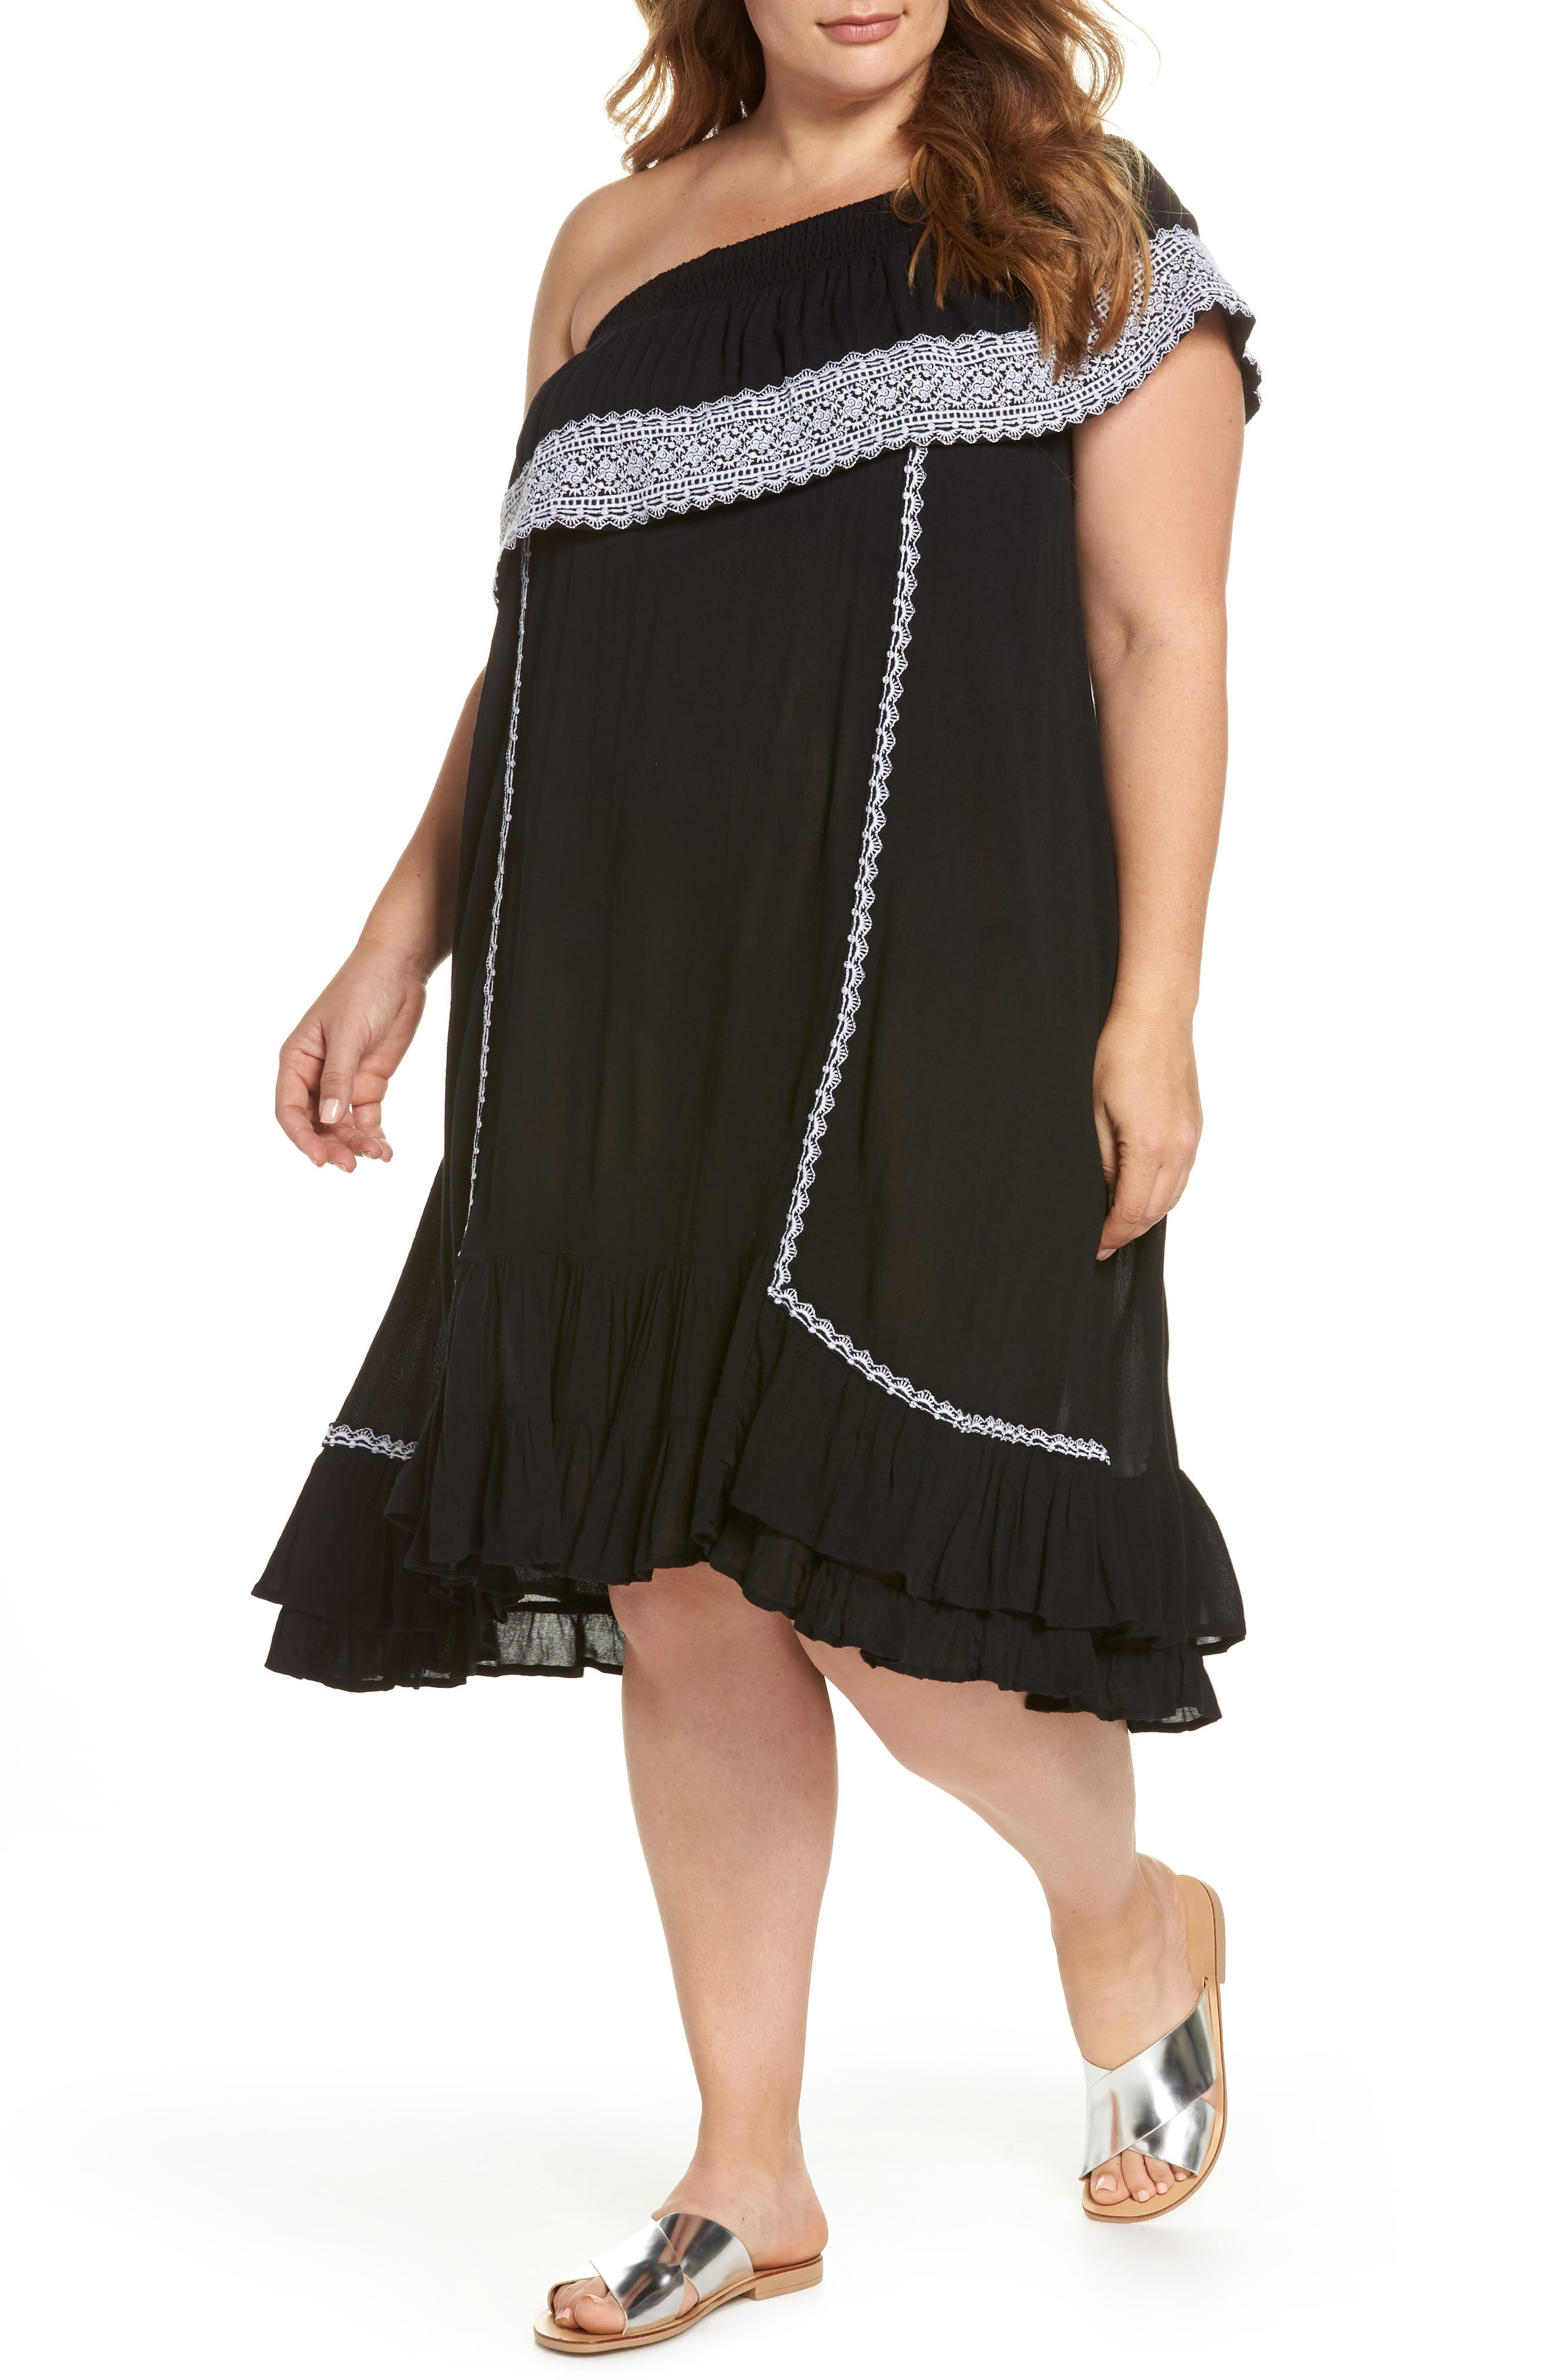 Gavin One-Shoulder Cover-Up Dress,                             Main thumbnail 1, color,                             002